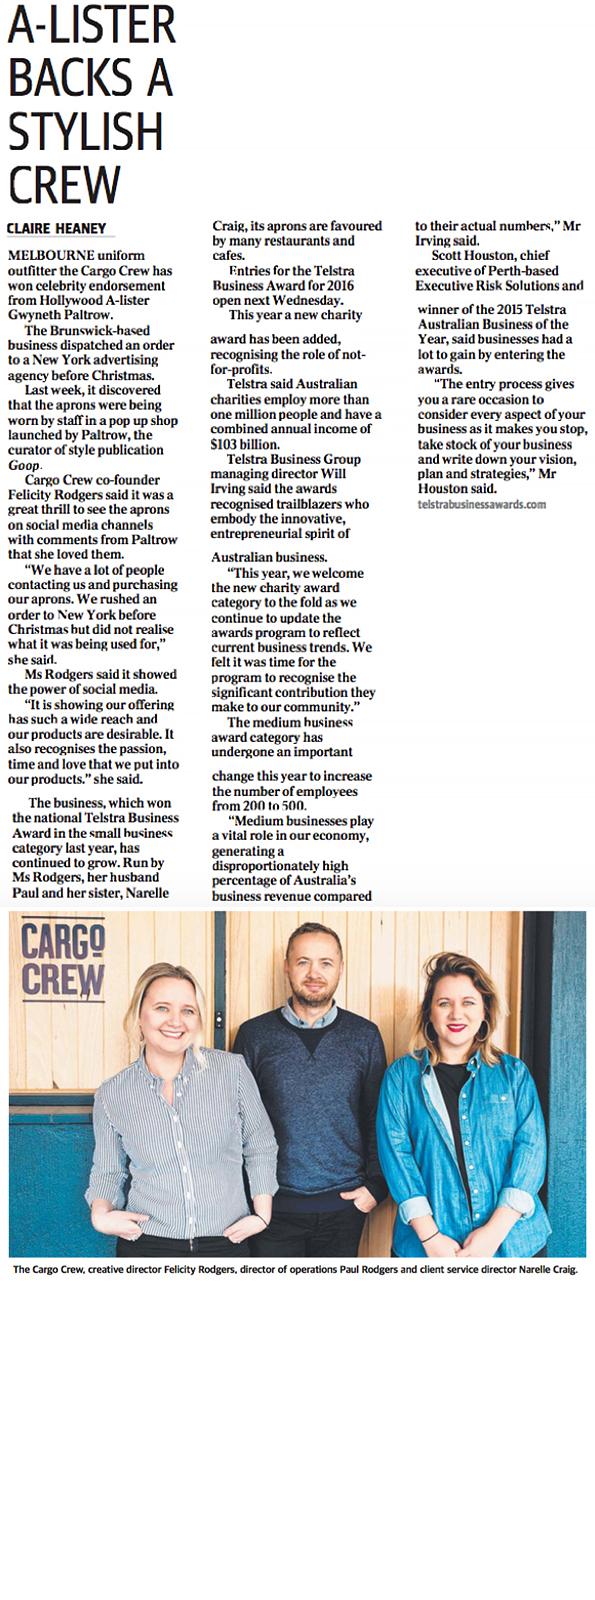 Cargo Crew Press | Herald Sun